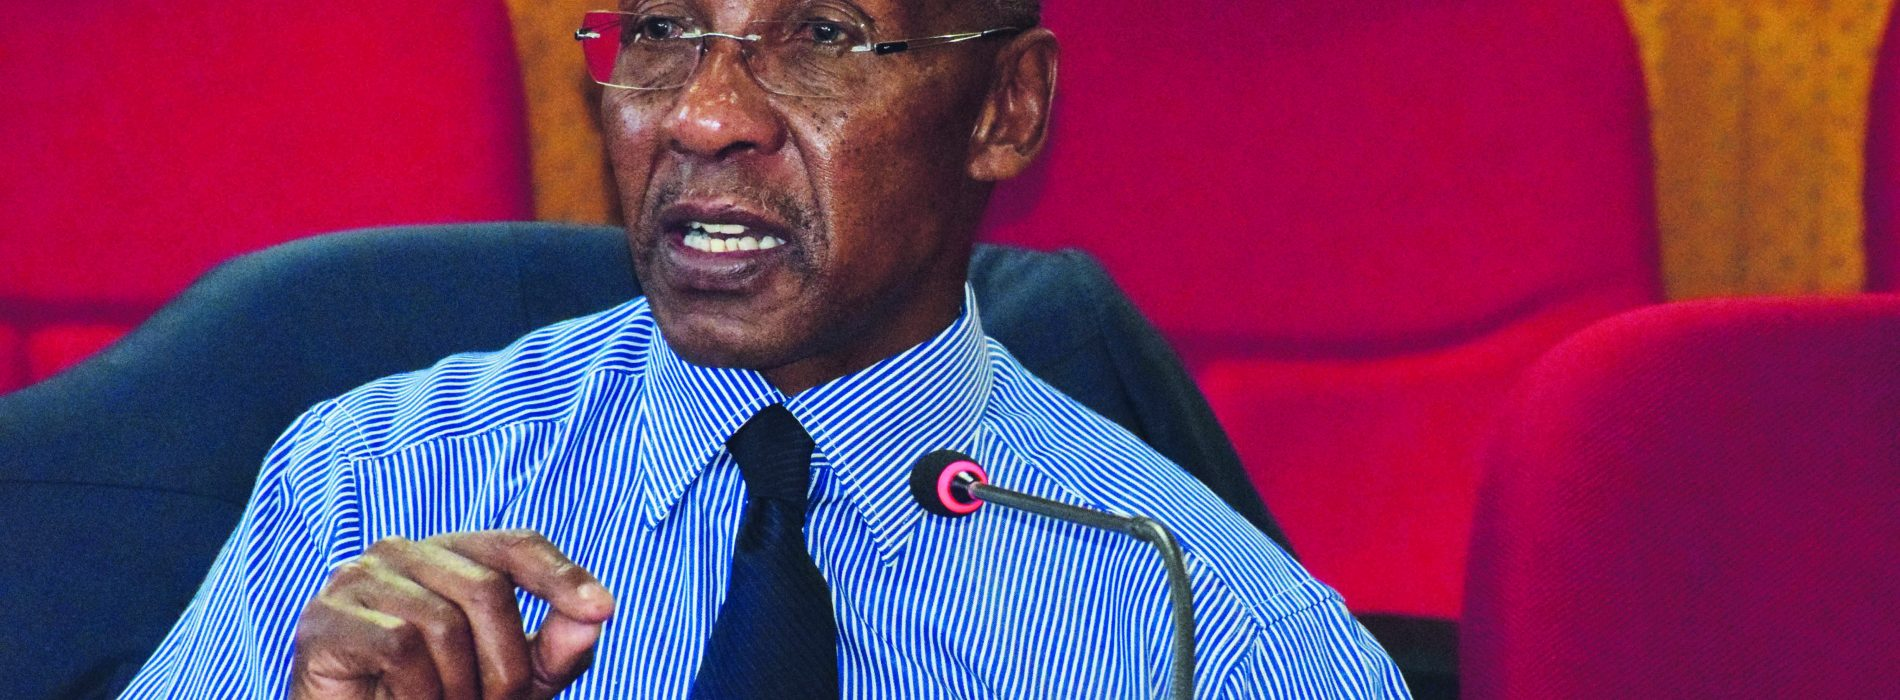 Stone Shi should be jailed, says farmer